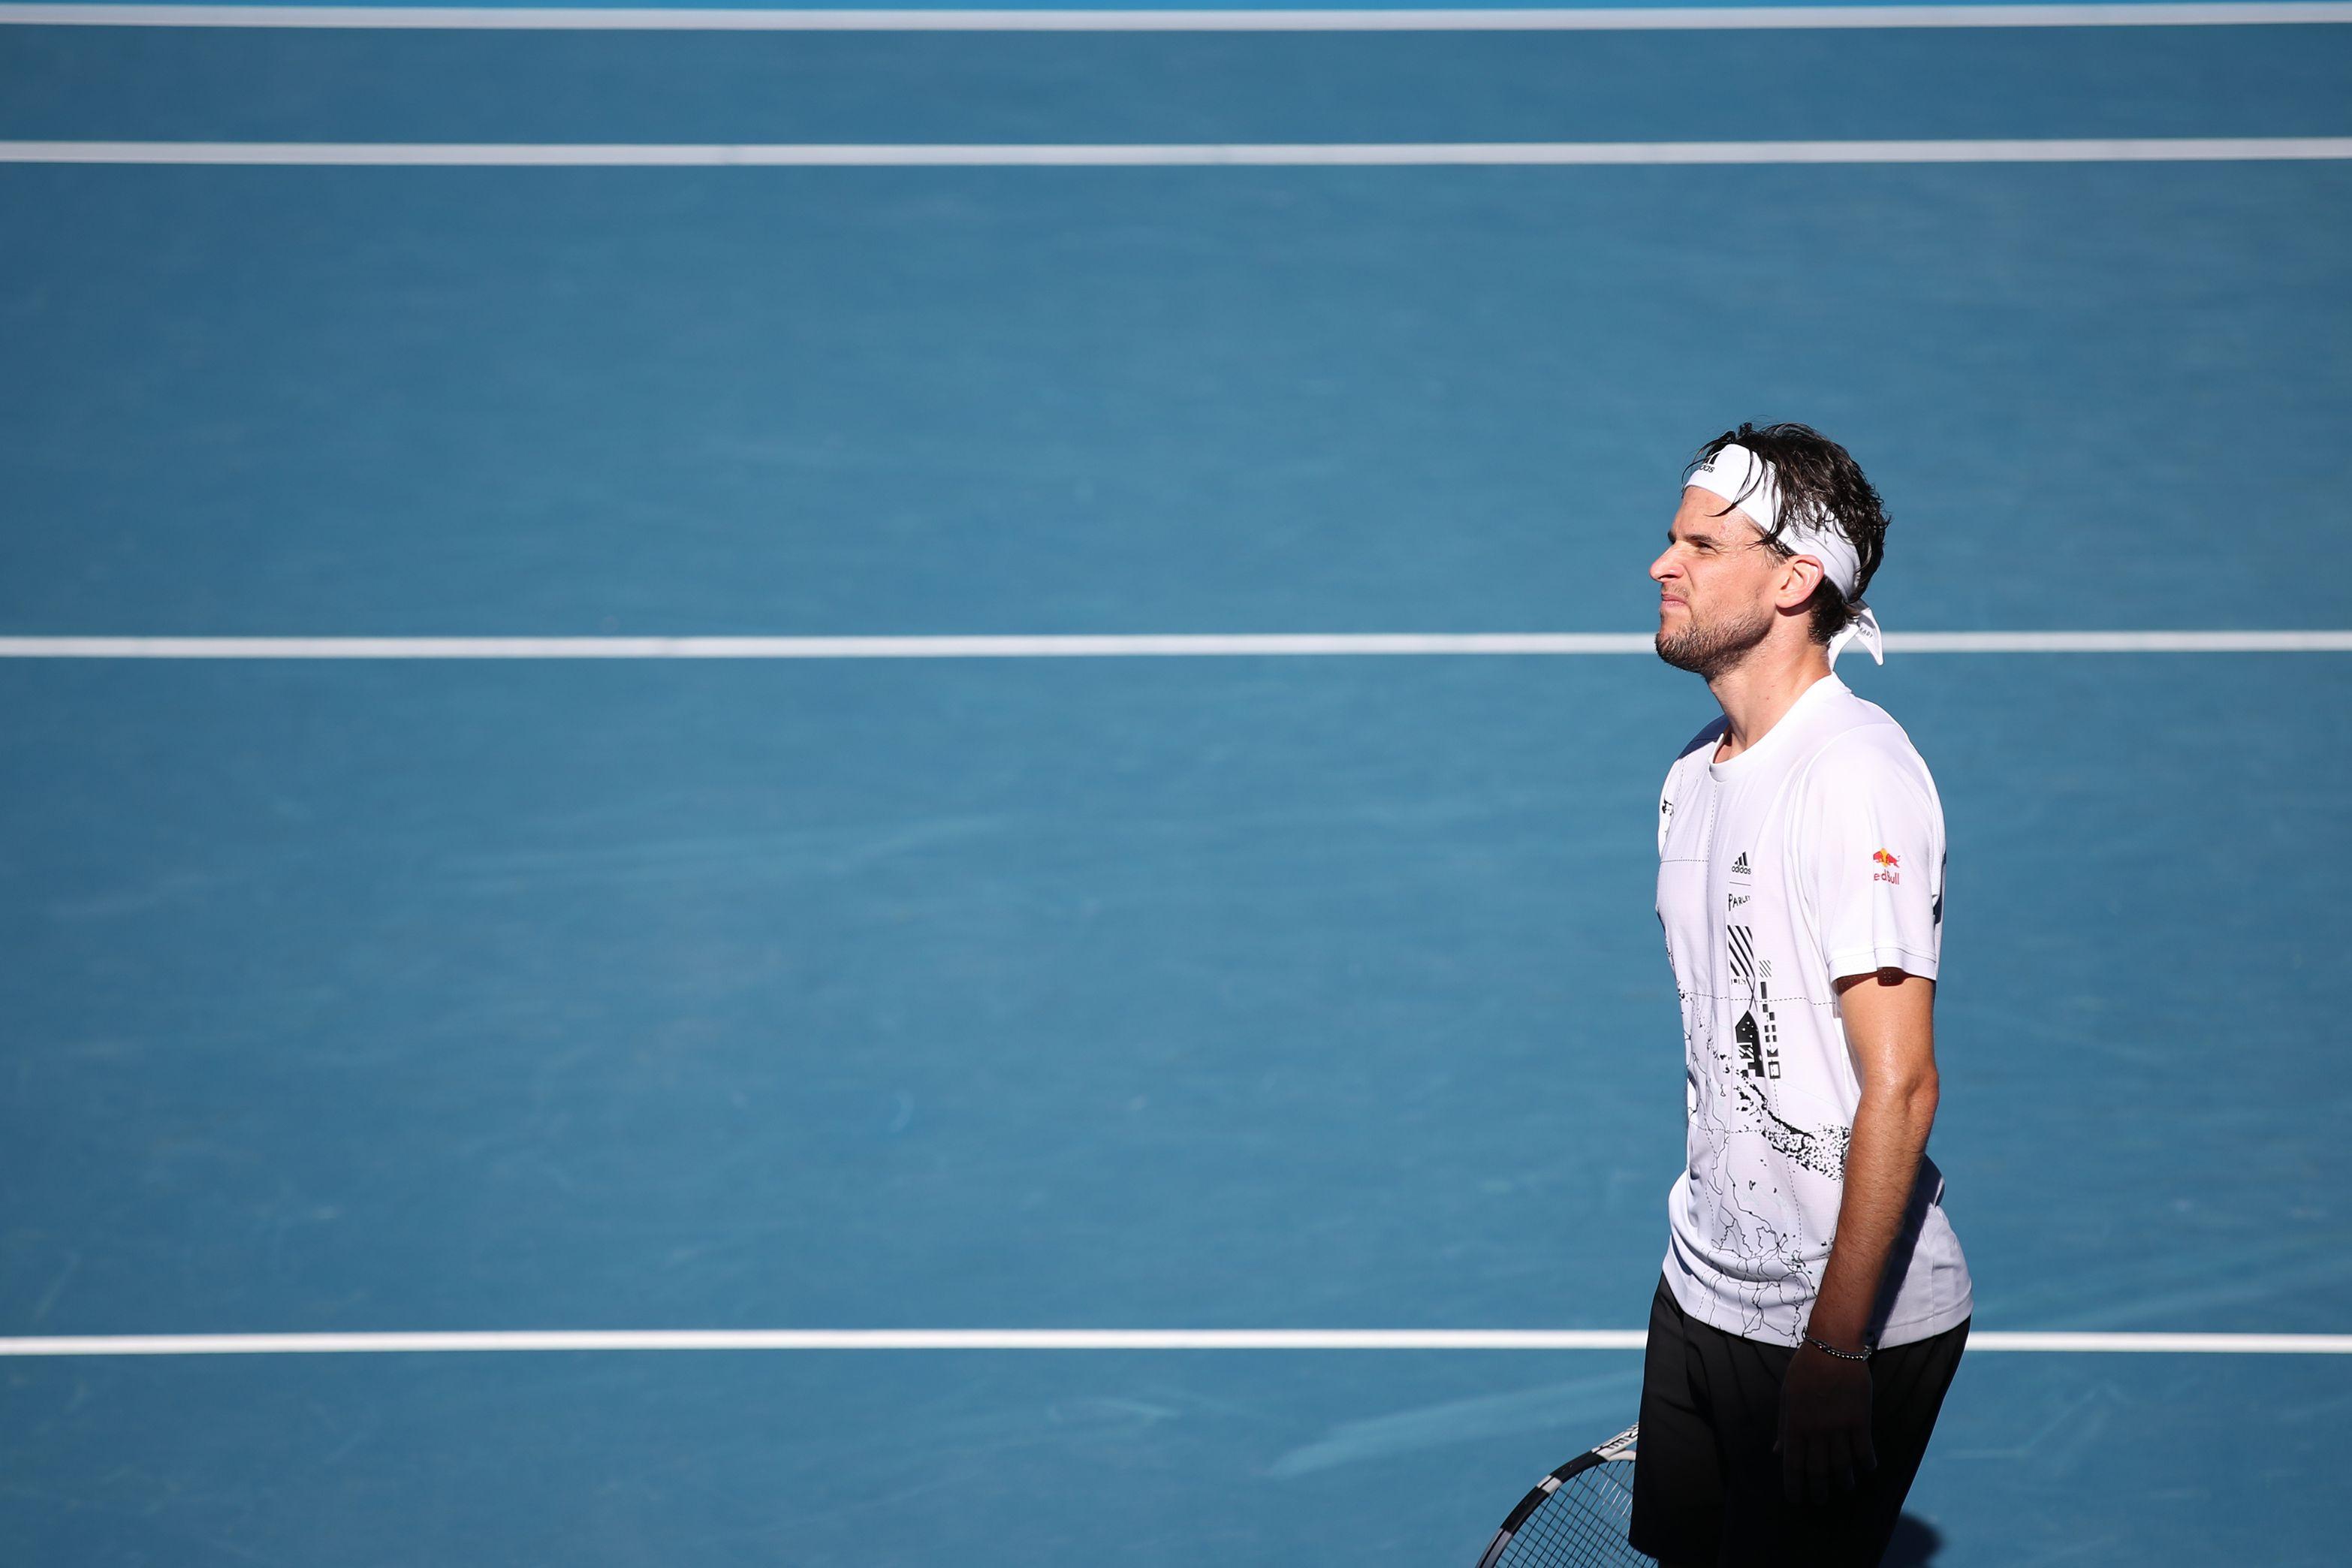 Менеджер Тима рассказал о травме теннисиста